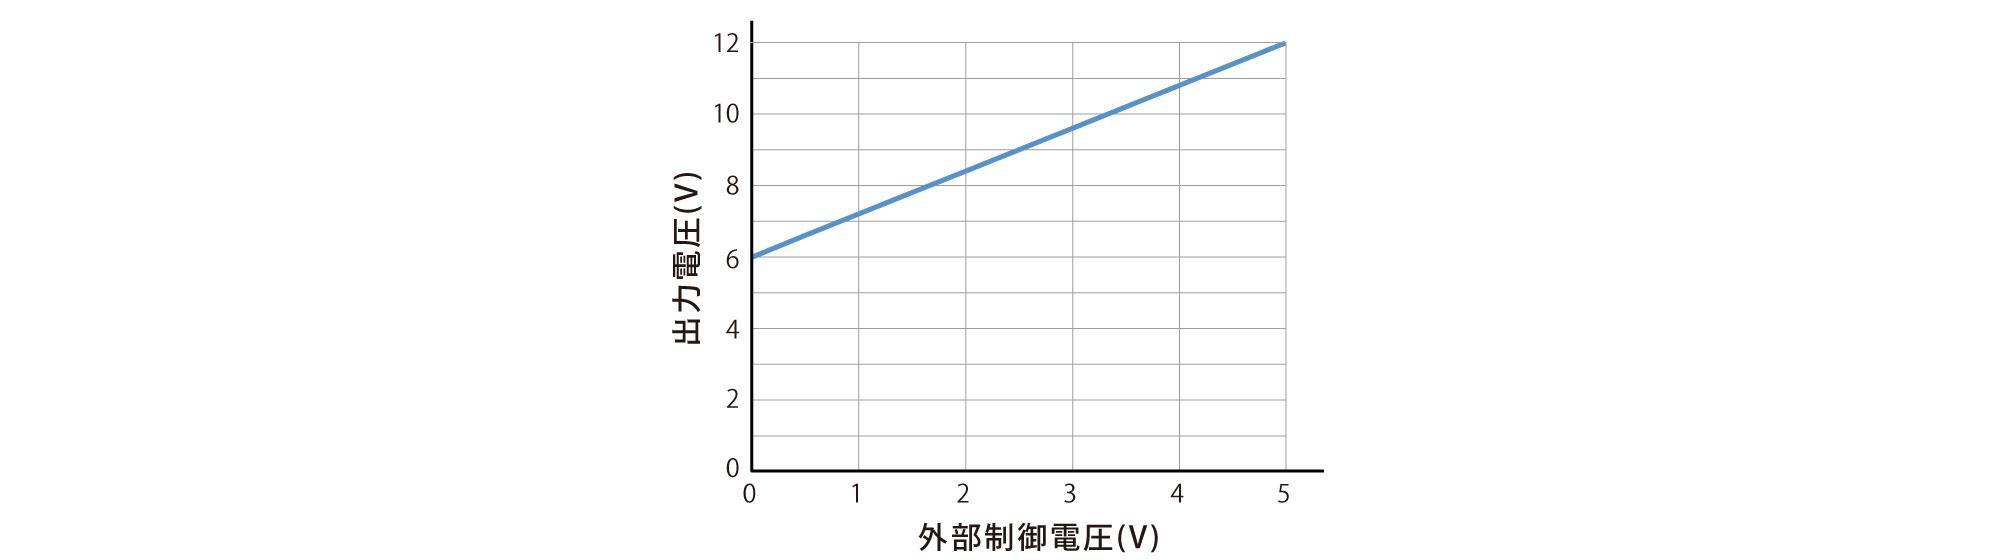 ILV Product Description 02